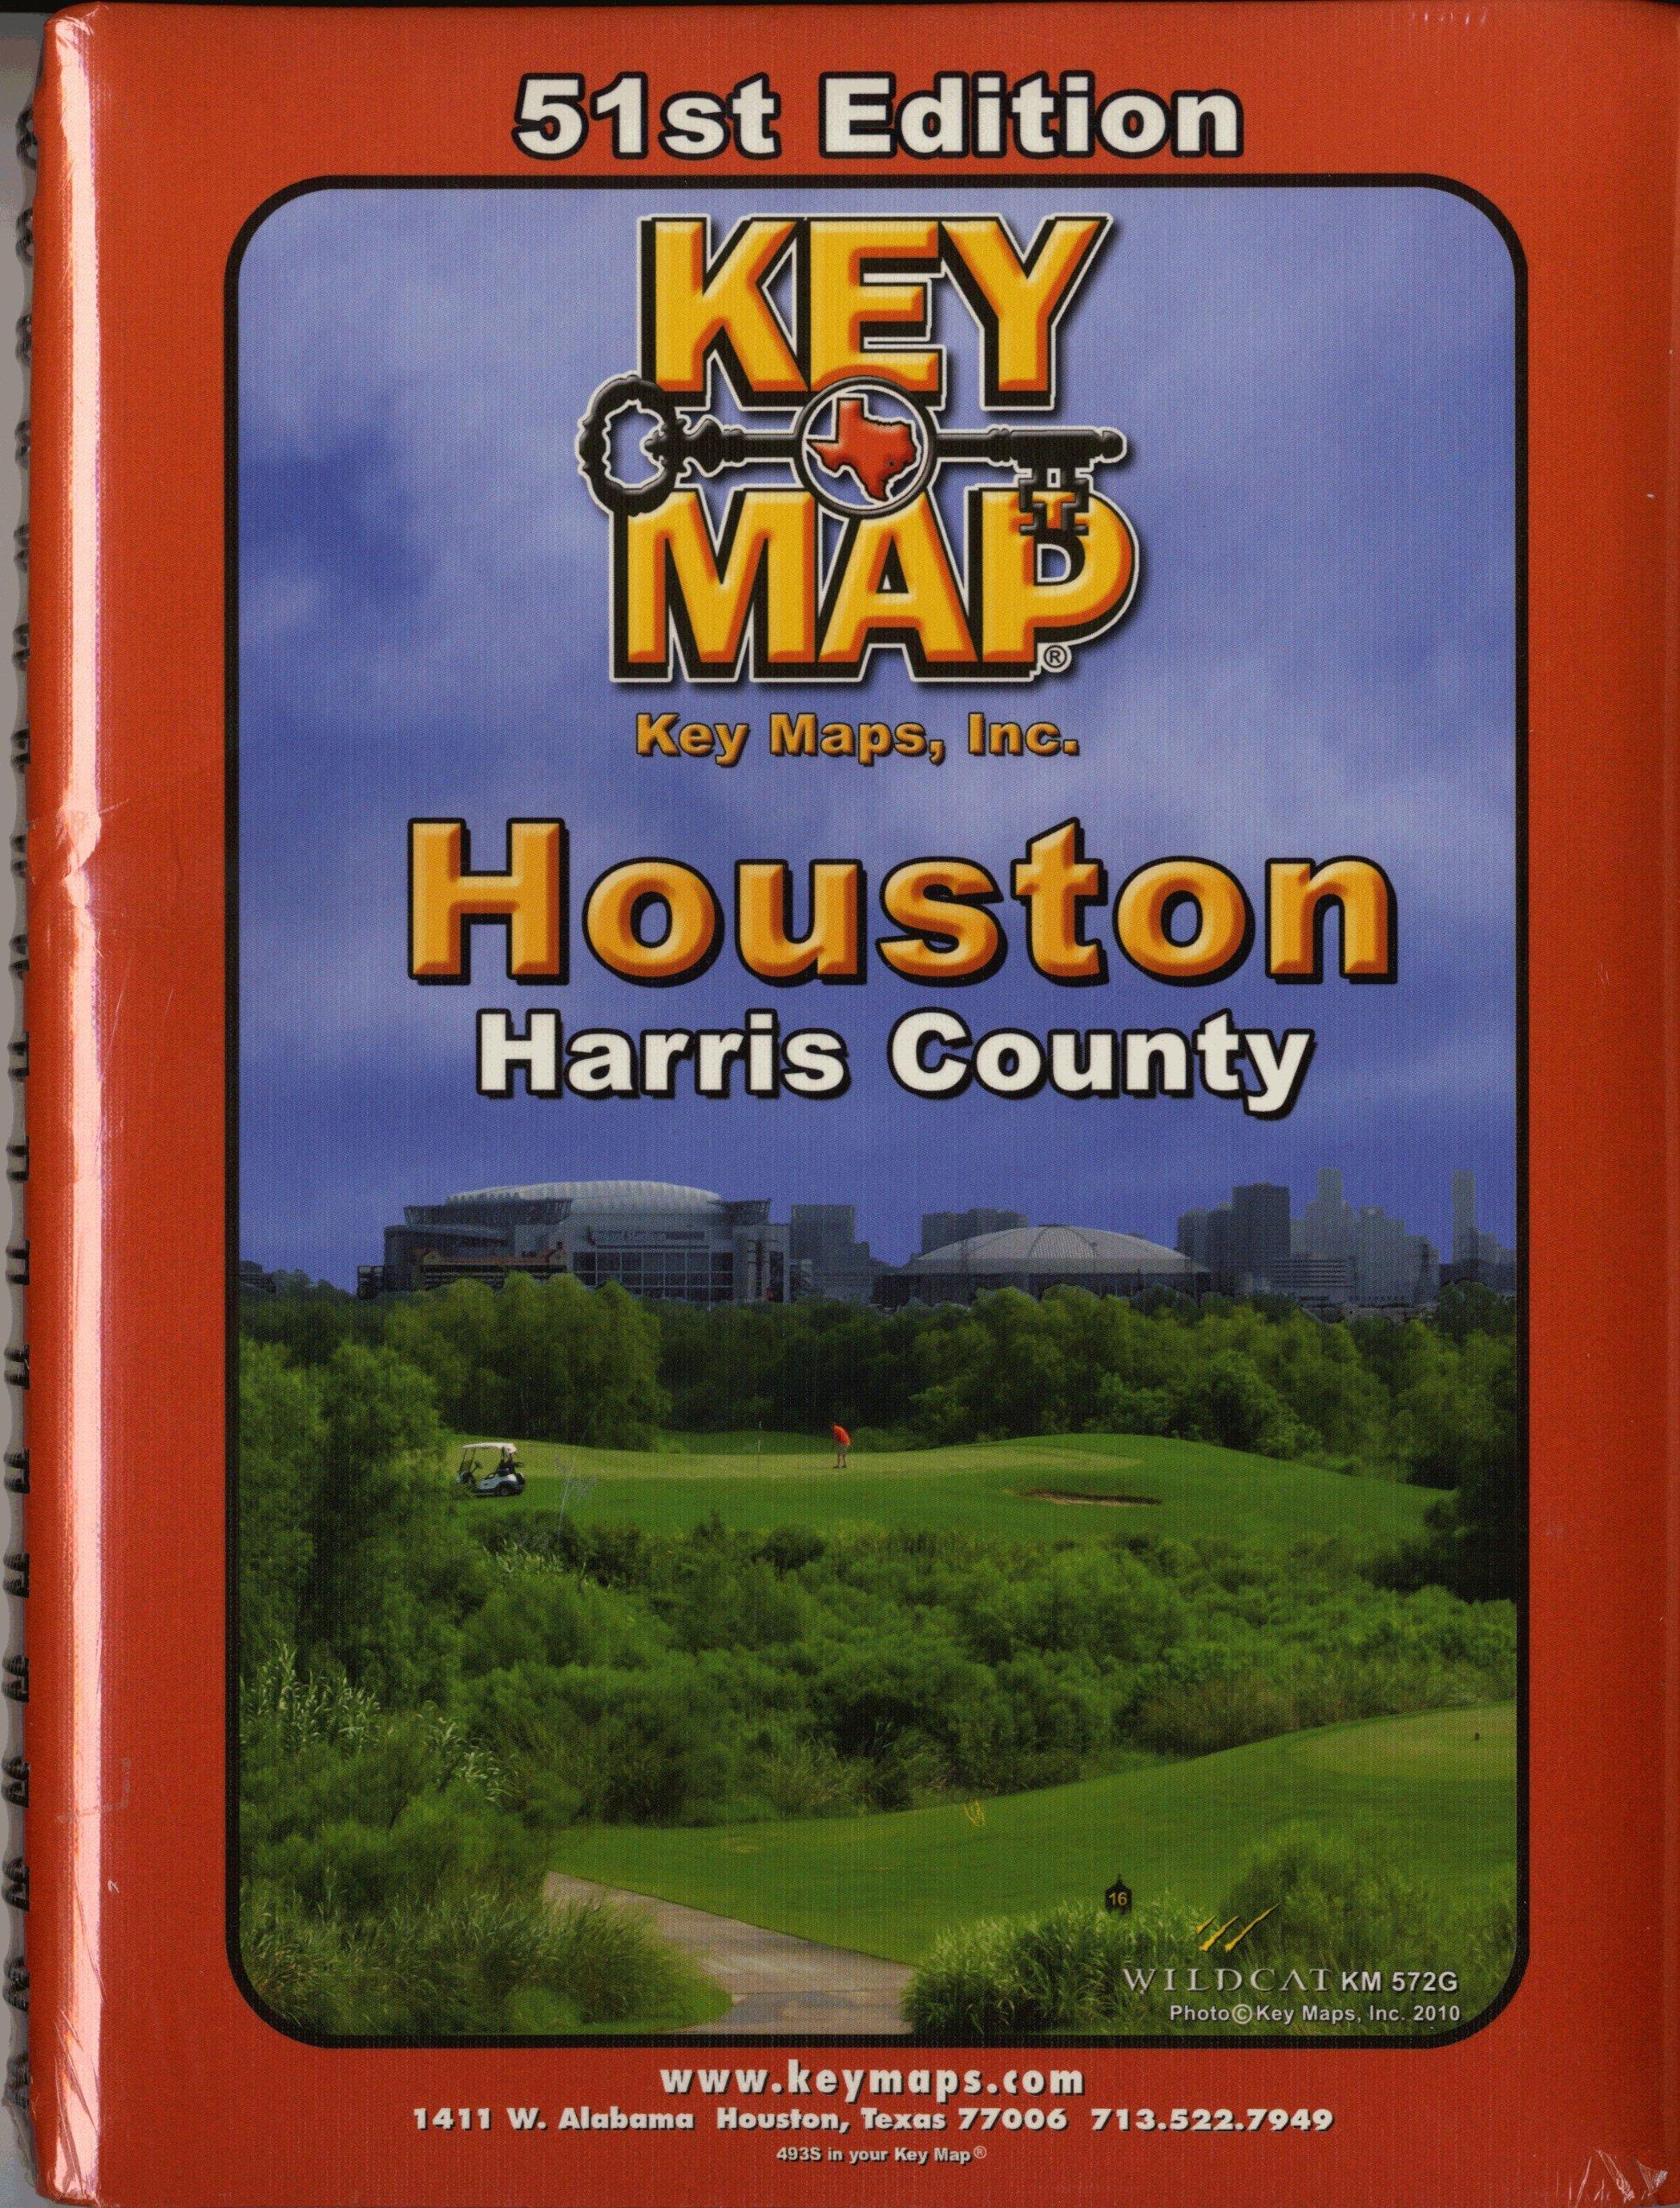 Houston, Harris County Street Atlas (Key Map): Key Maps Inc ... on graph key, help key, home key, no name key, defiant lock key, city key, del key, elevation key, ferry to anclote key, list key, game key, microscope key, art key, clock key, plate tectonics crossword answer key, time key, table key, house key, car key, chart key,